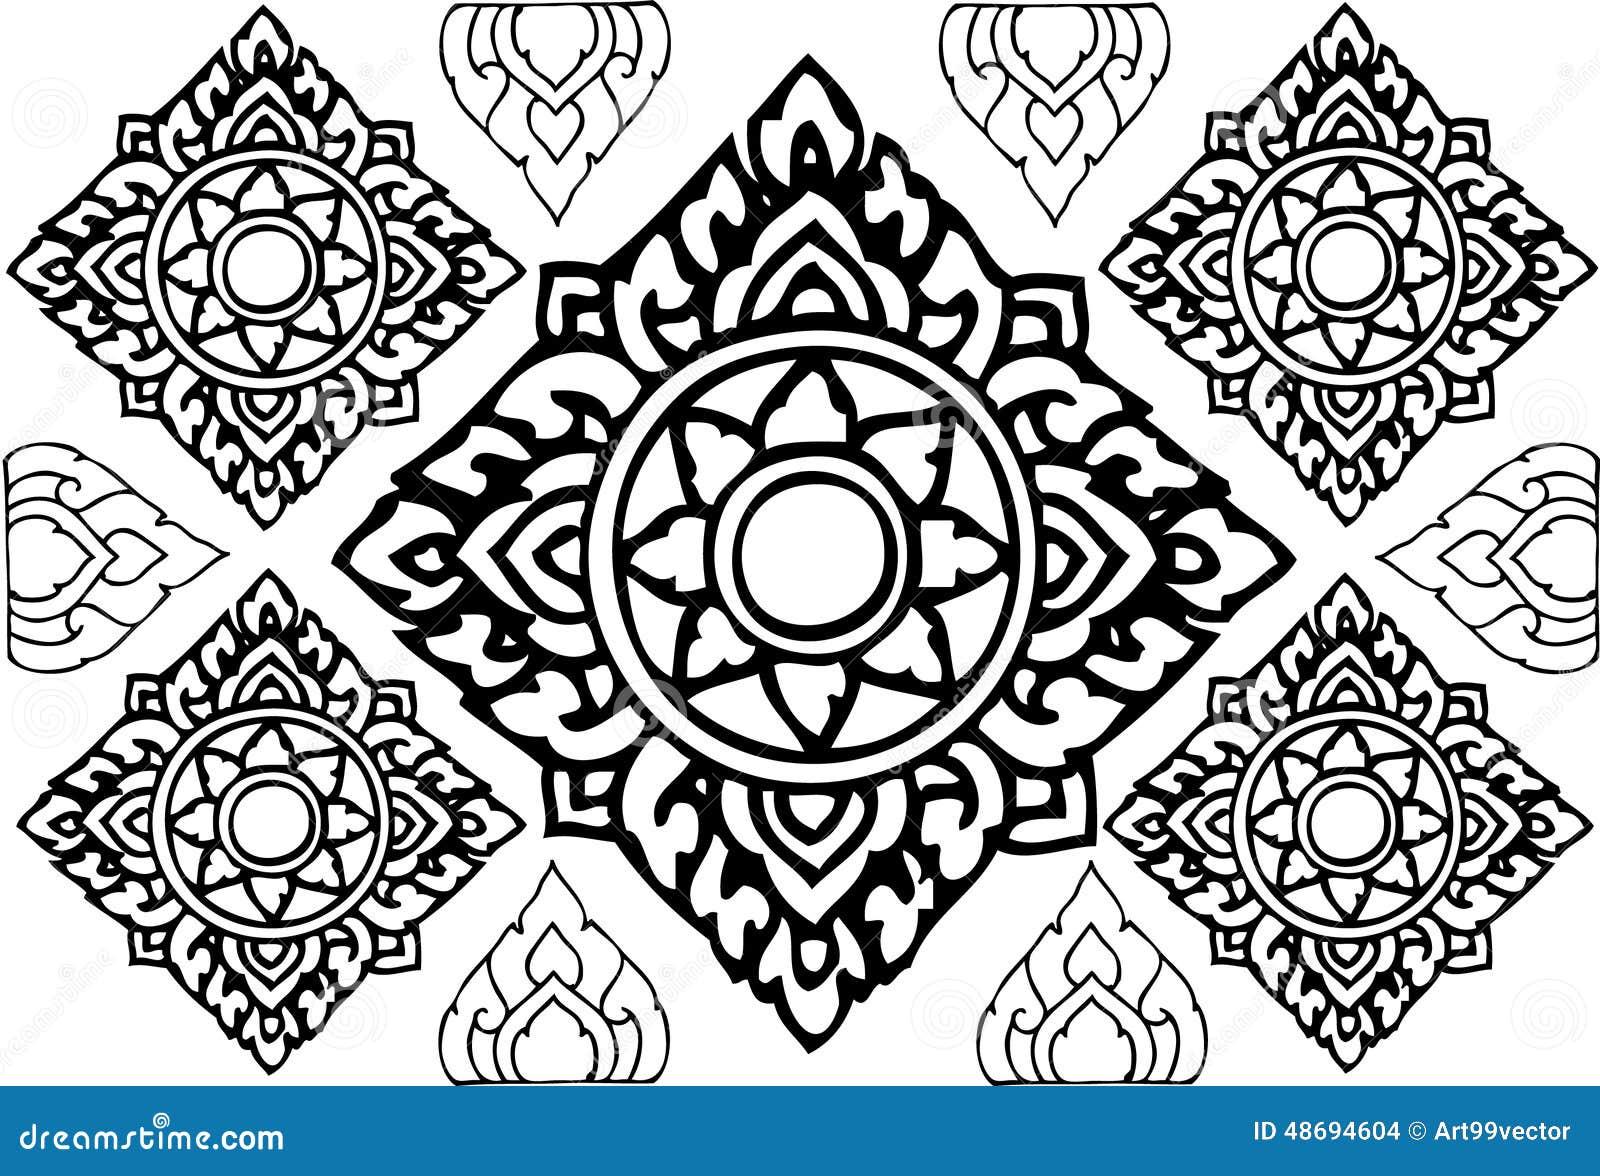 Graphic Line Design Art : Line thai design stock illustration image